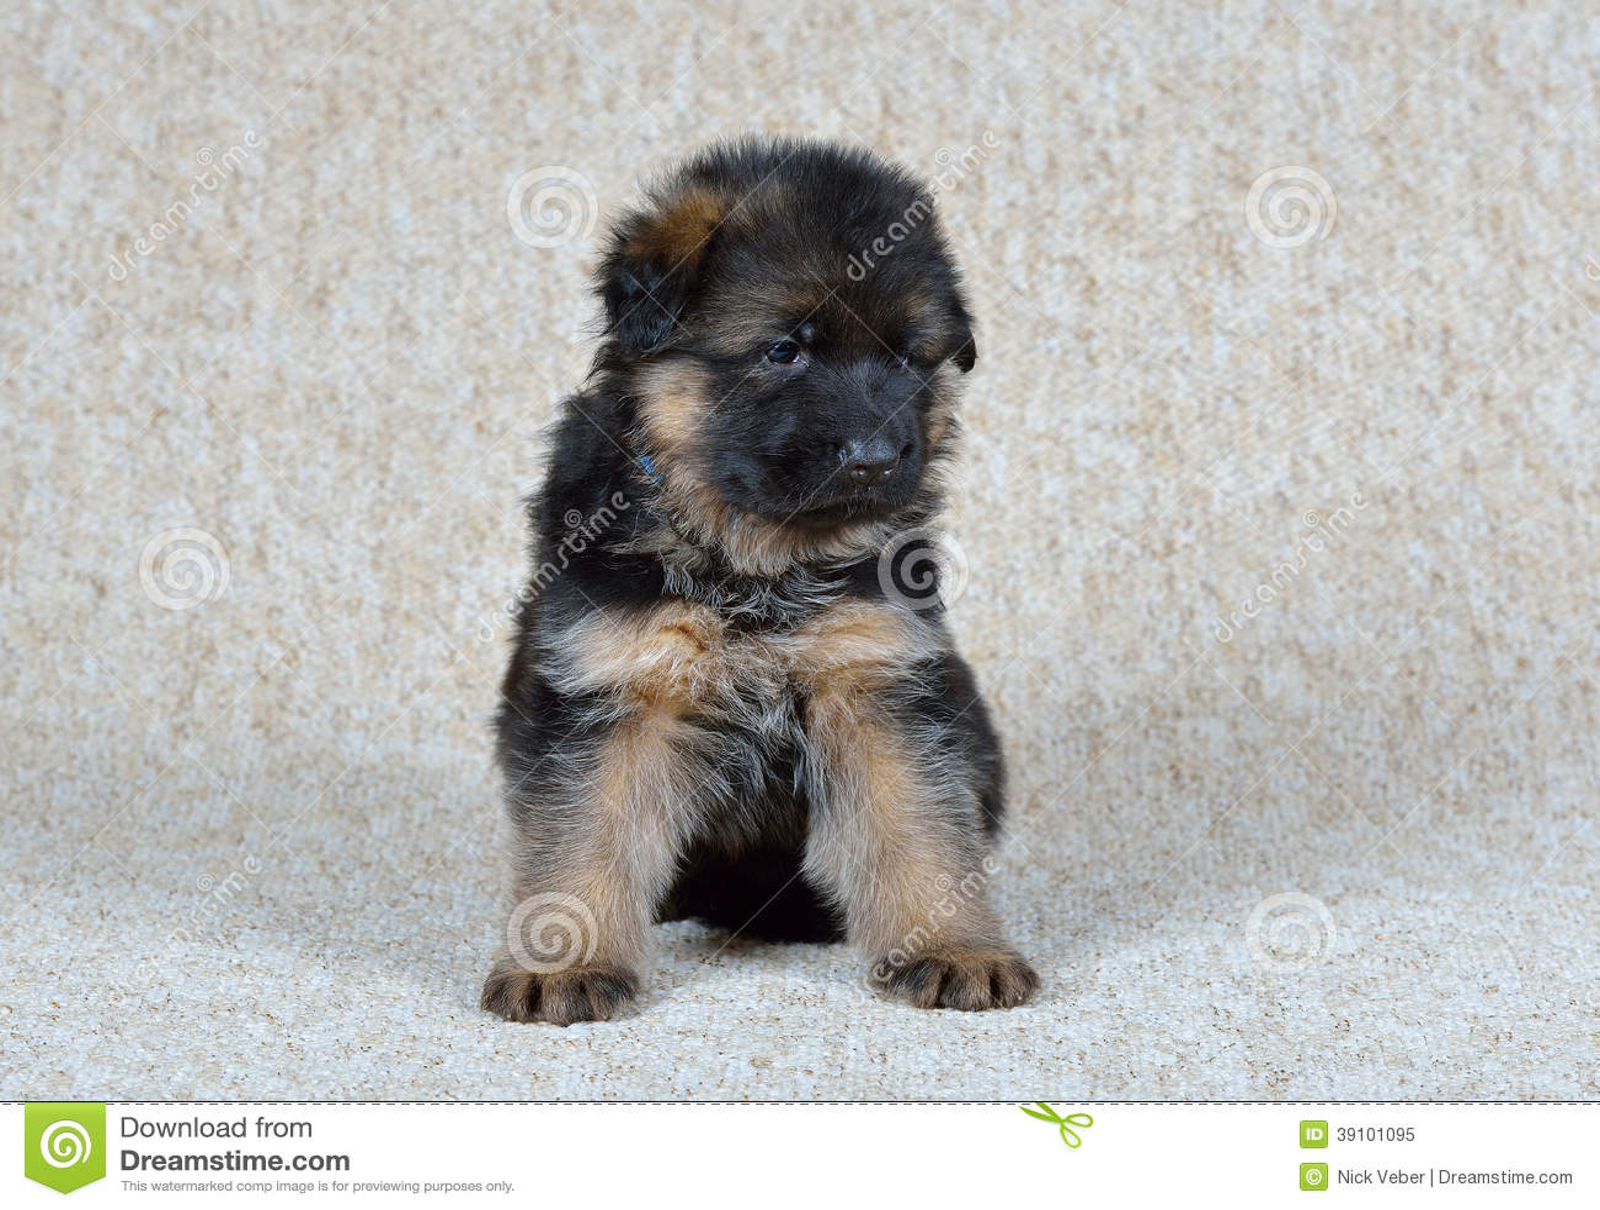 German Shepherd Puppy Stock Image Image Of White Animals 39101095